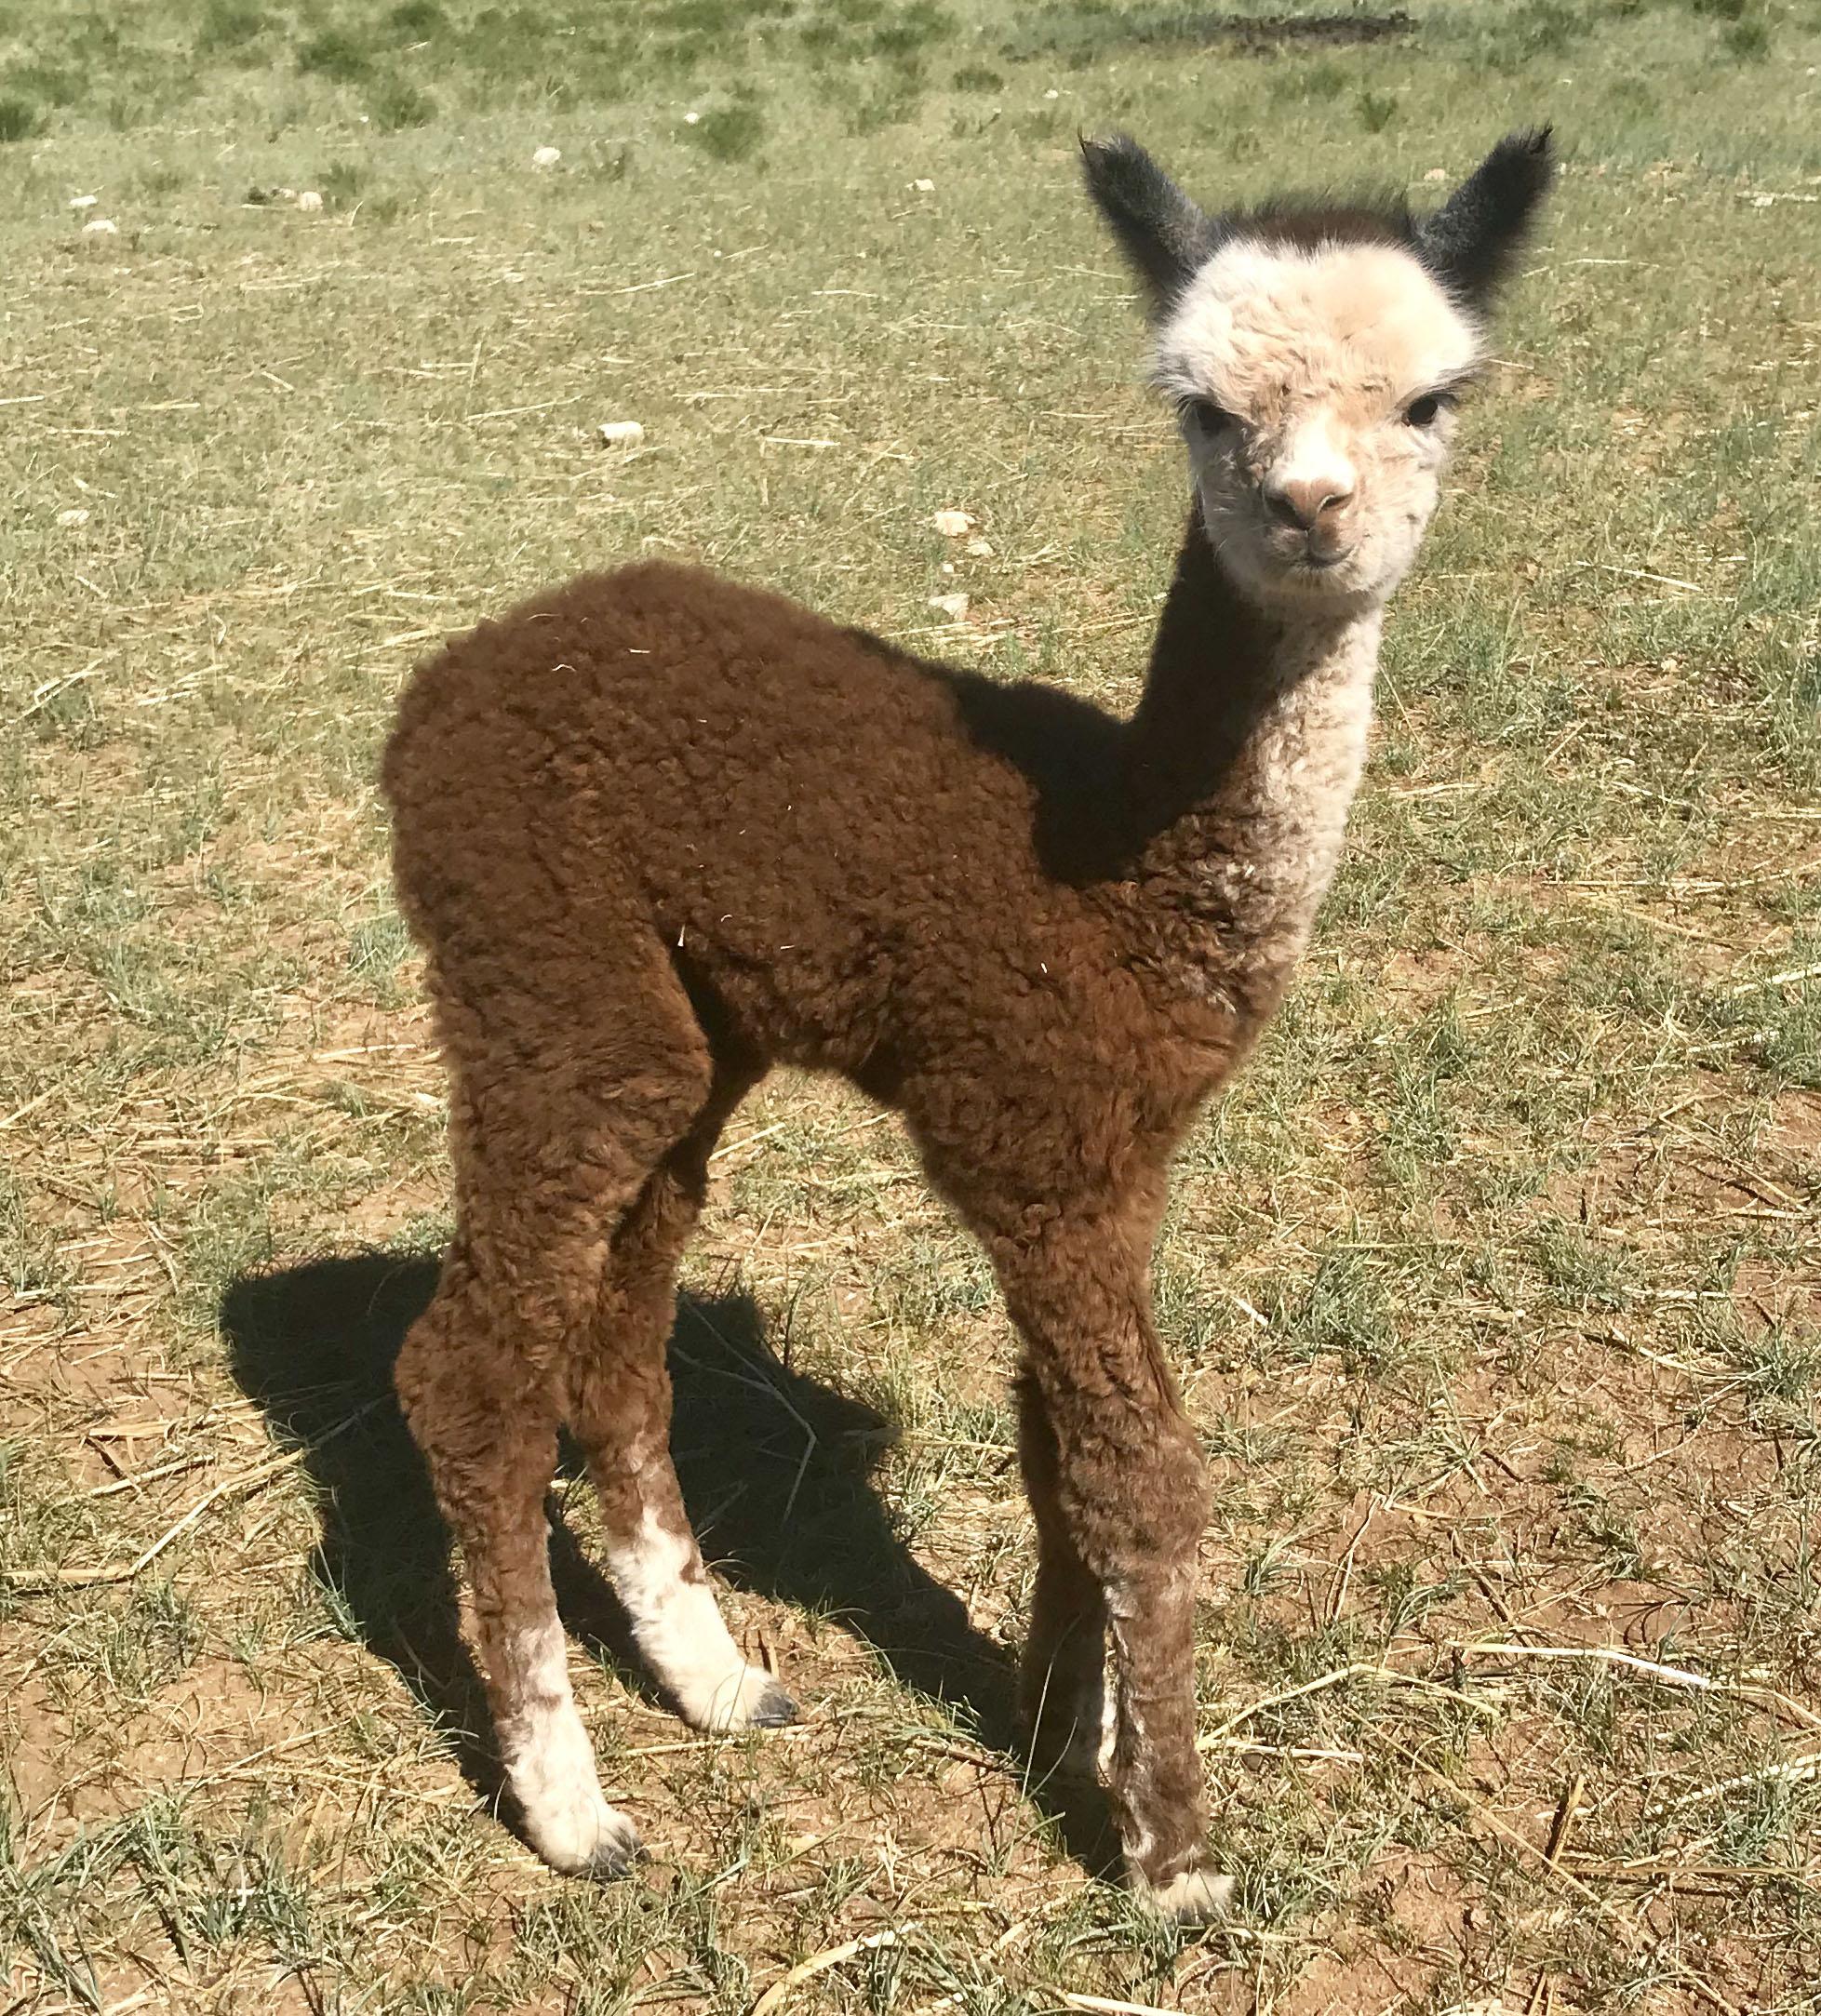 Ferdy Cria alpaca